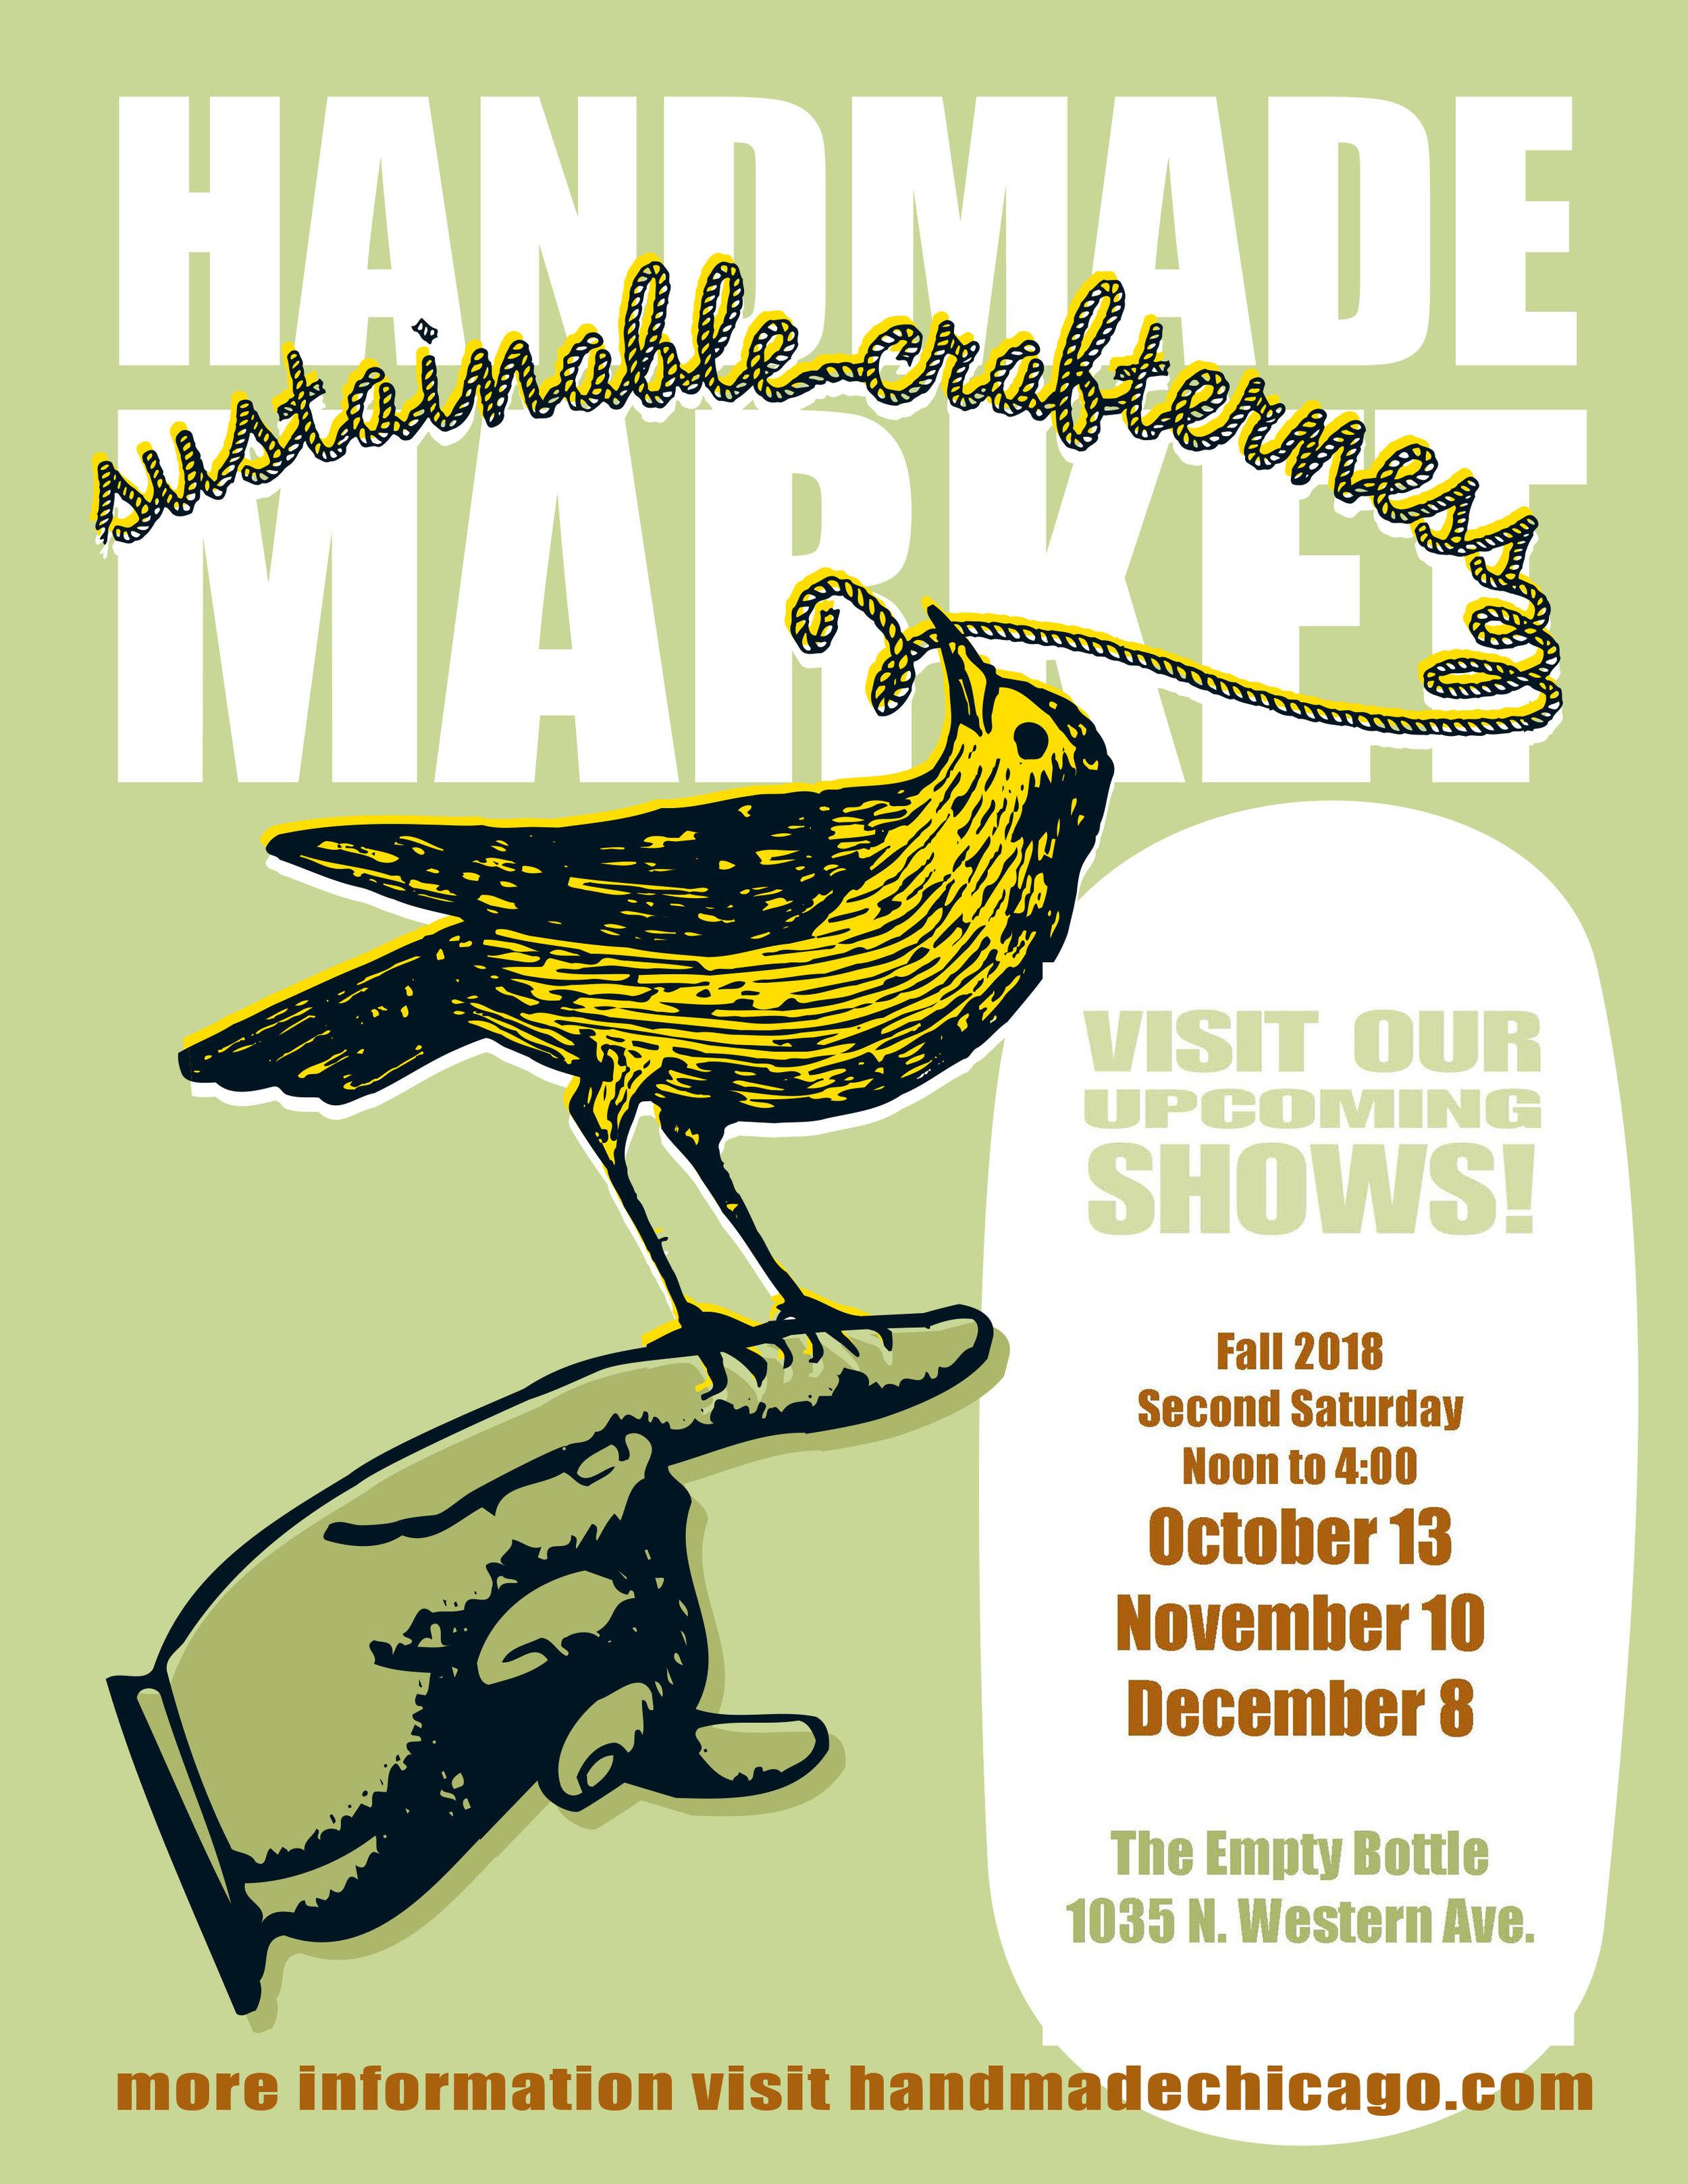 I'll see you December 8th!  #HandmadeMarketChicago